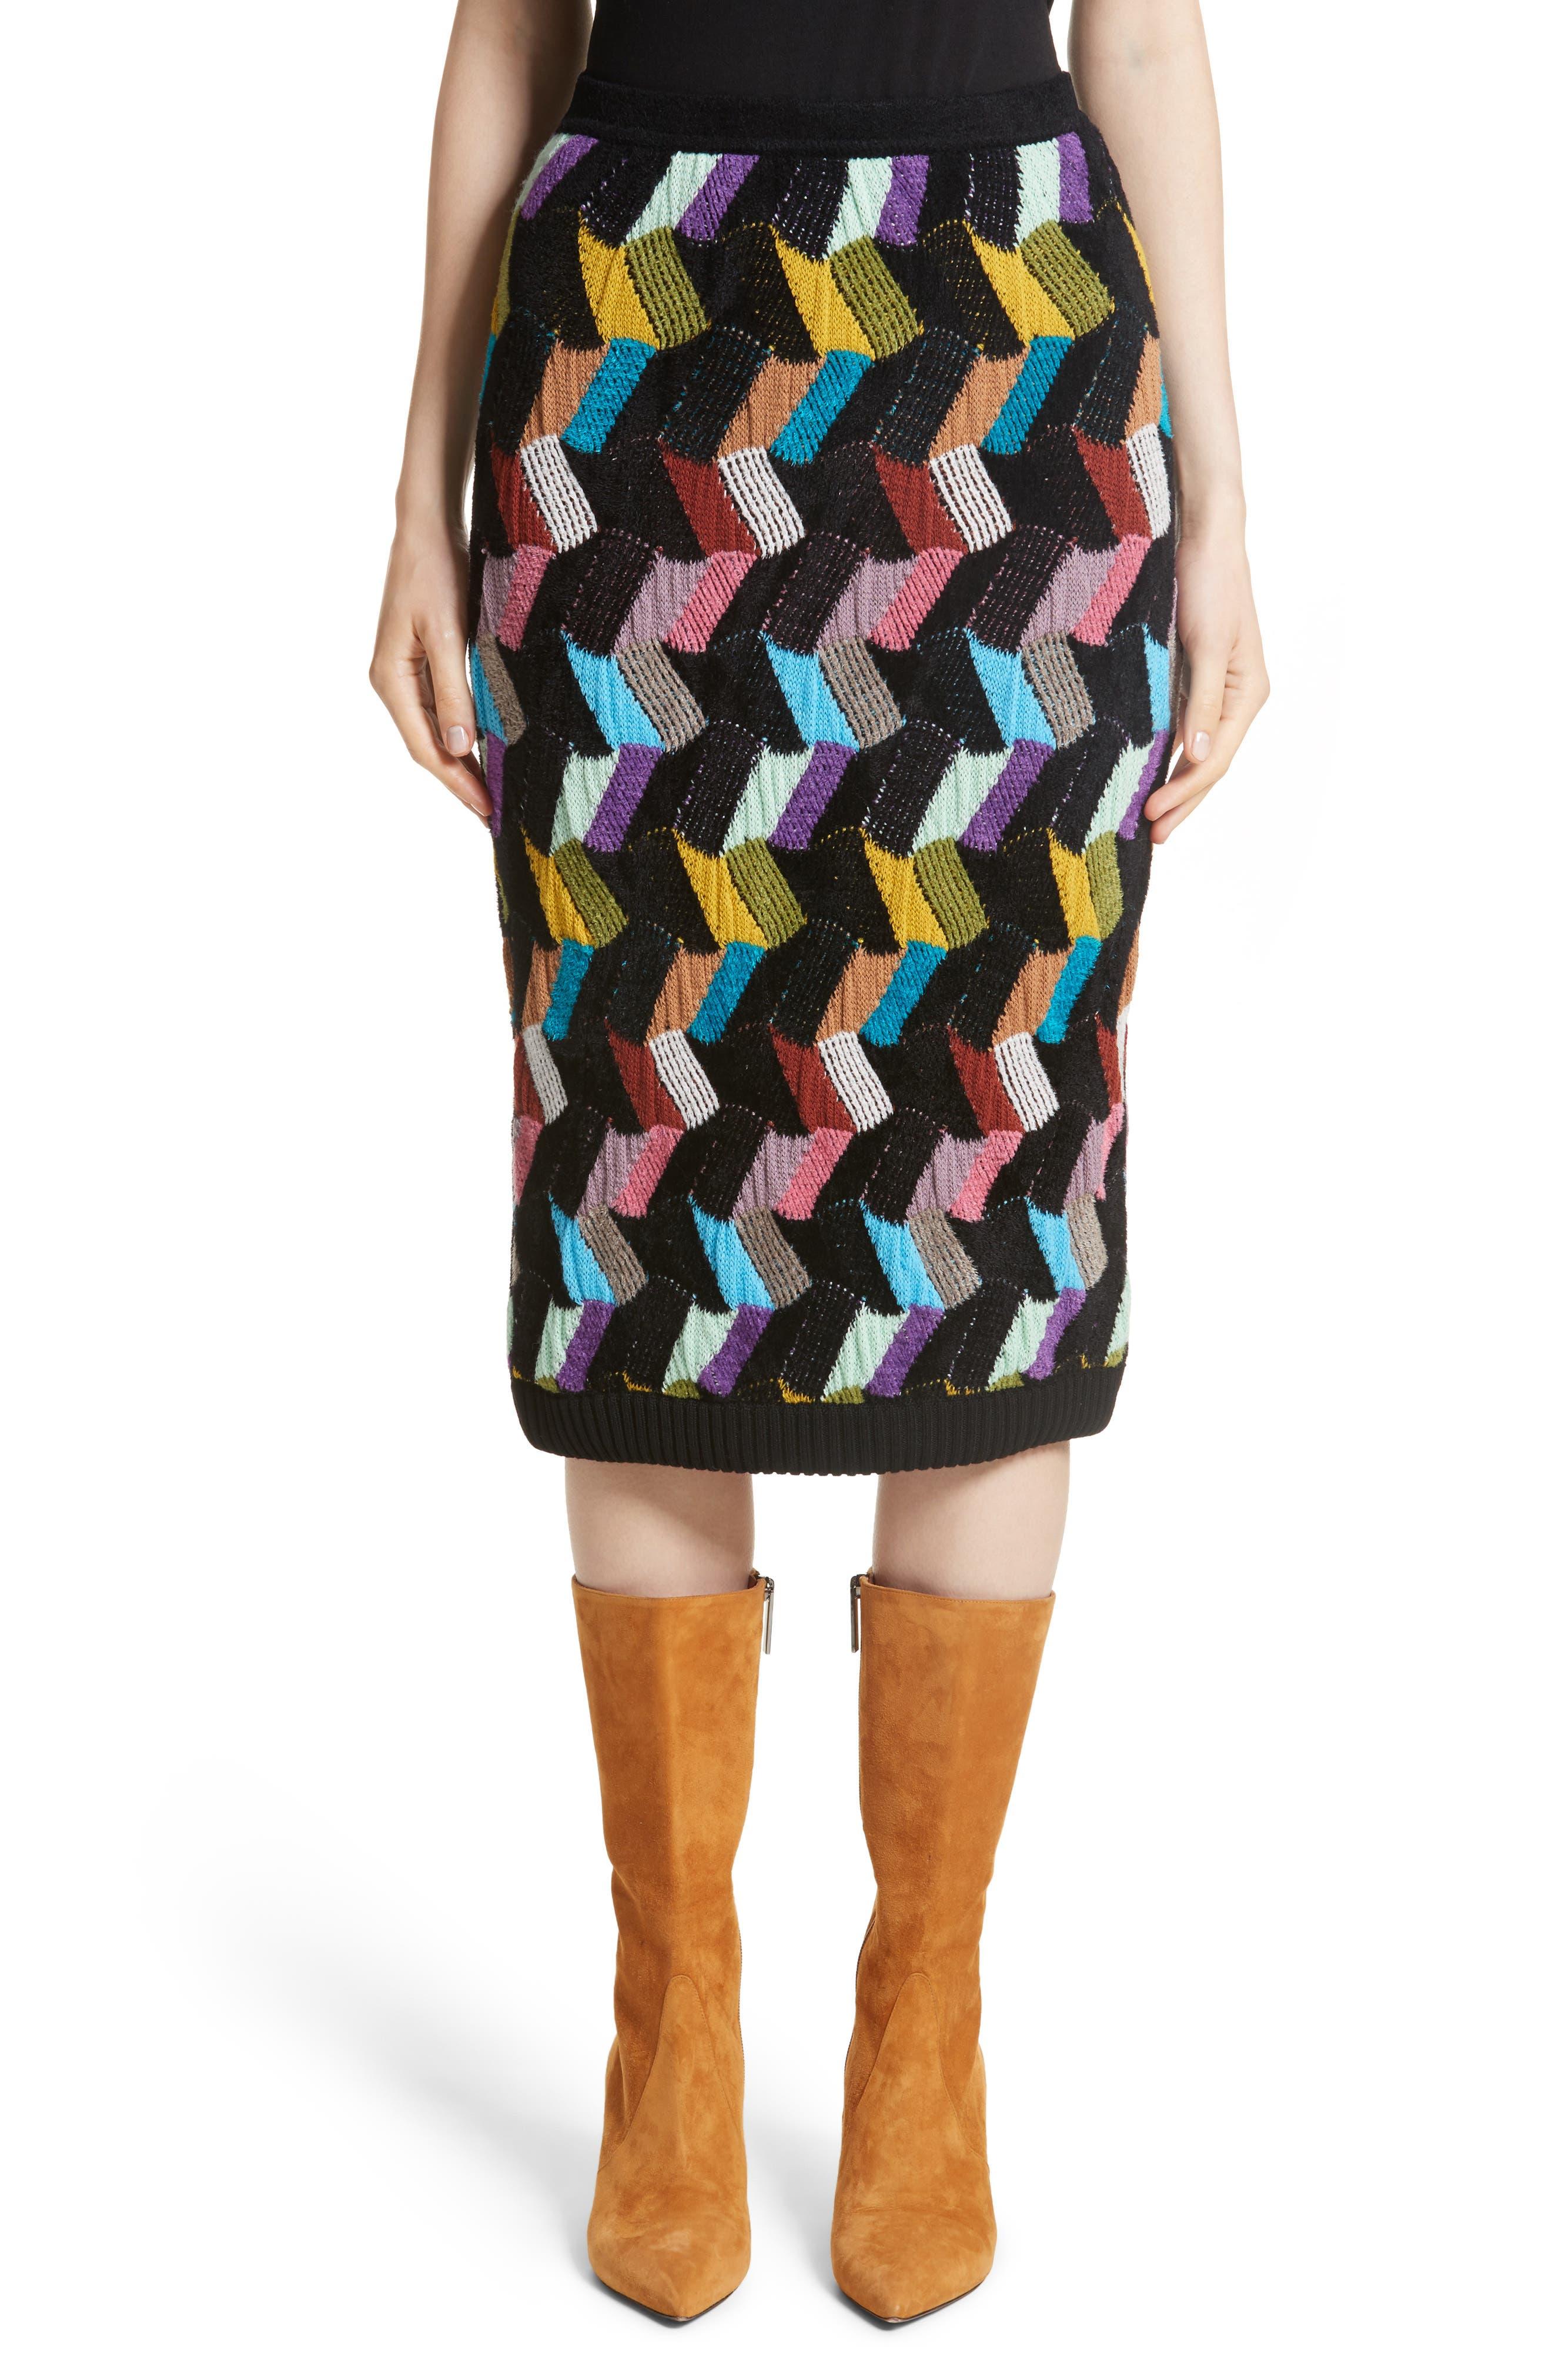 Alternate Image 1 Selected - Missoni Multi Knit Pencil Skirt